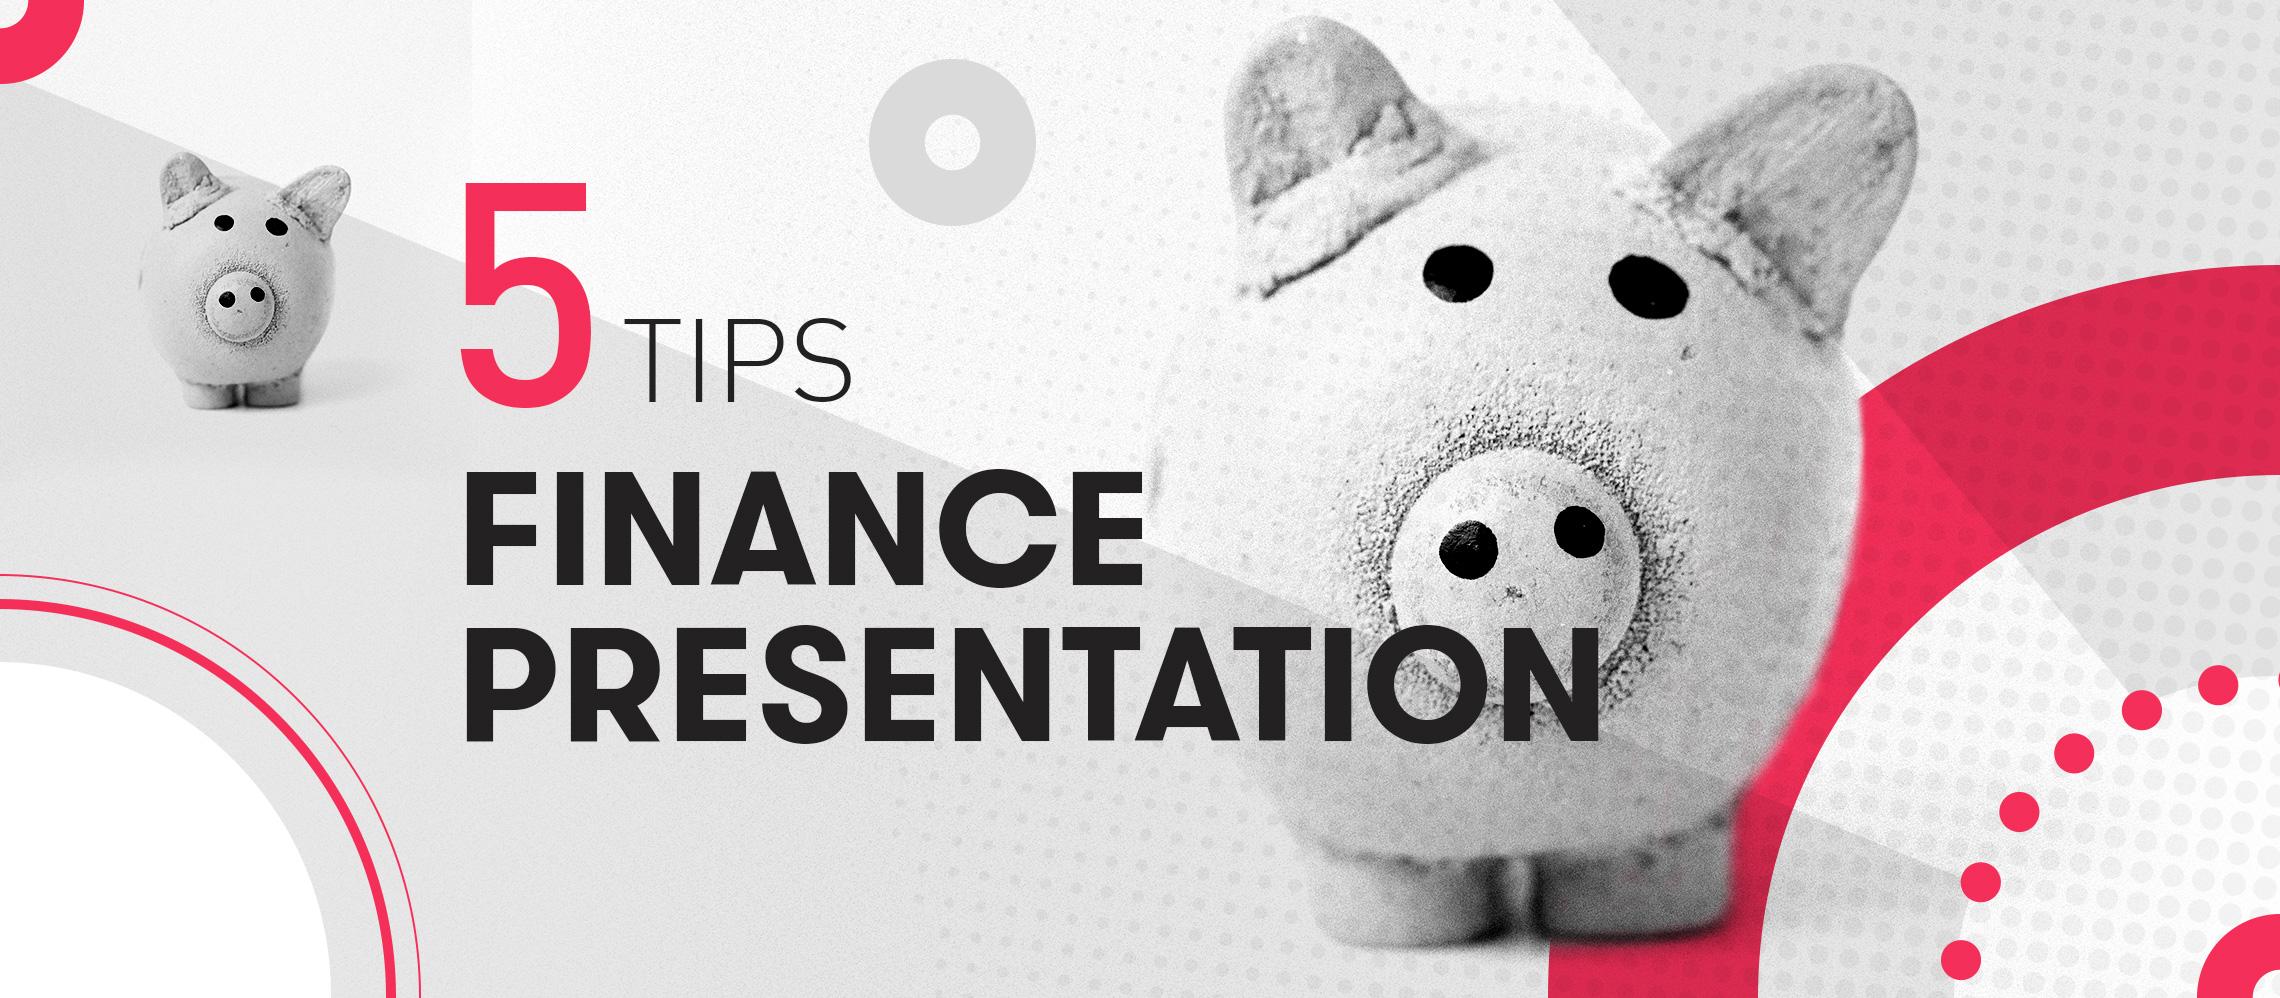 The five-step formula for making finance presentations interesting